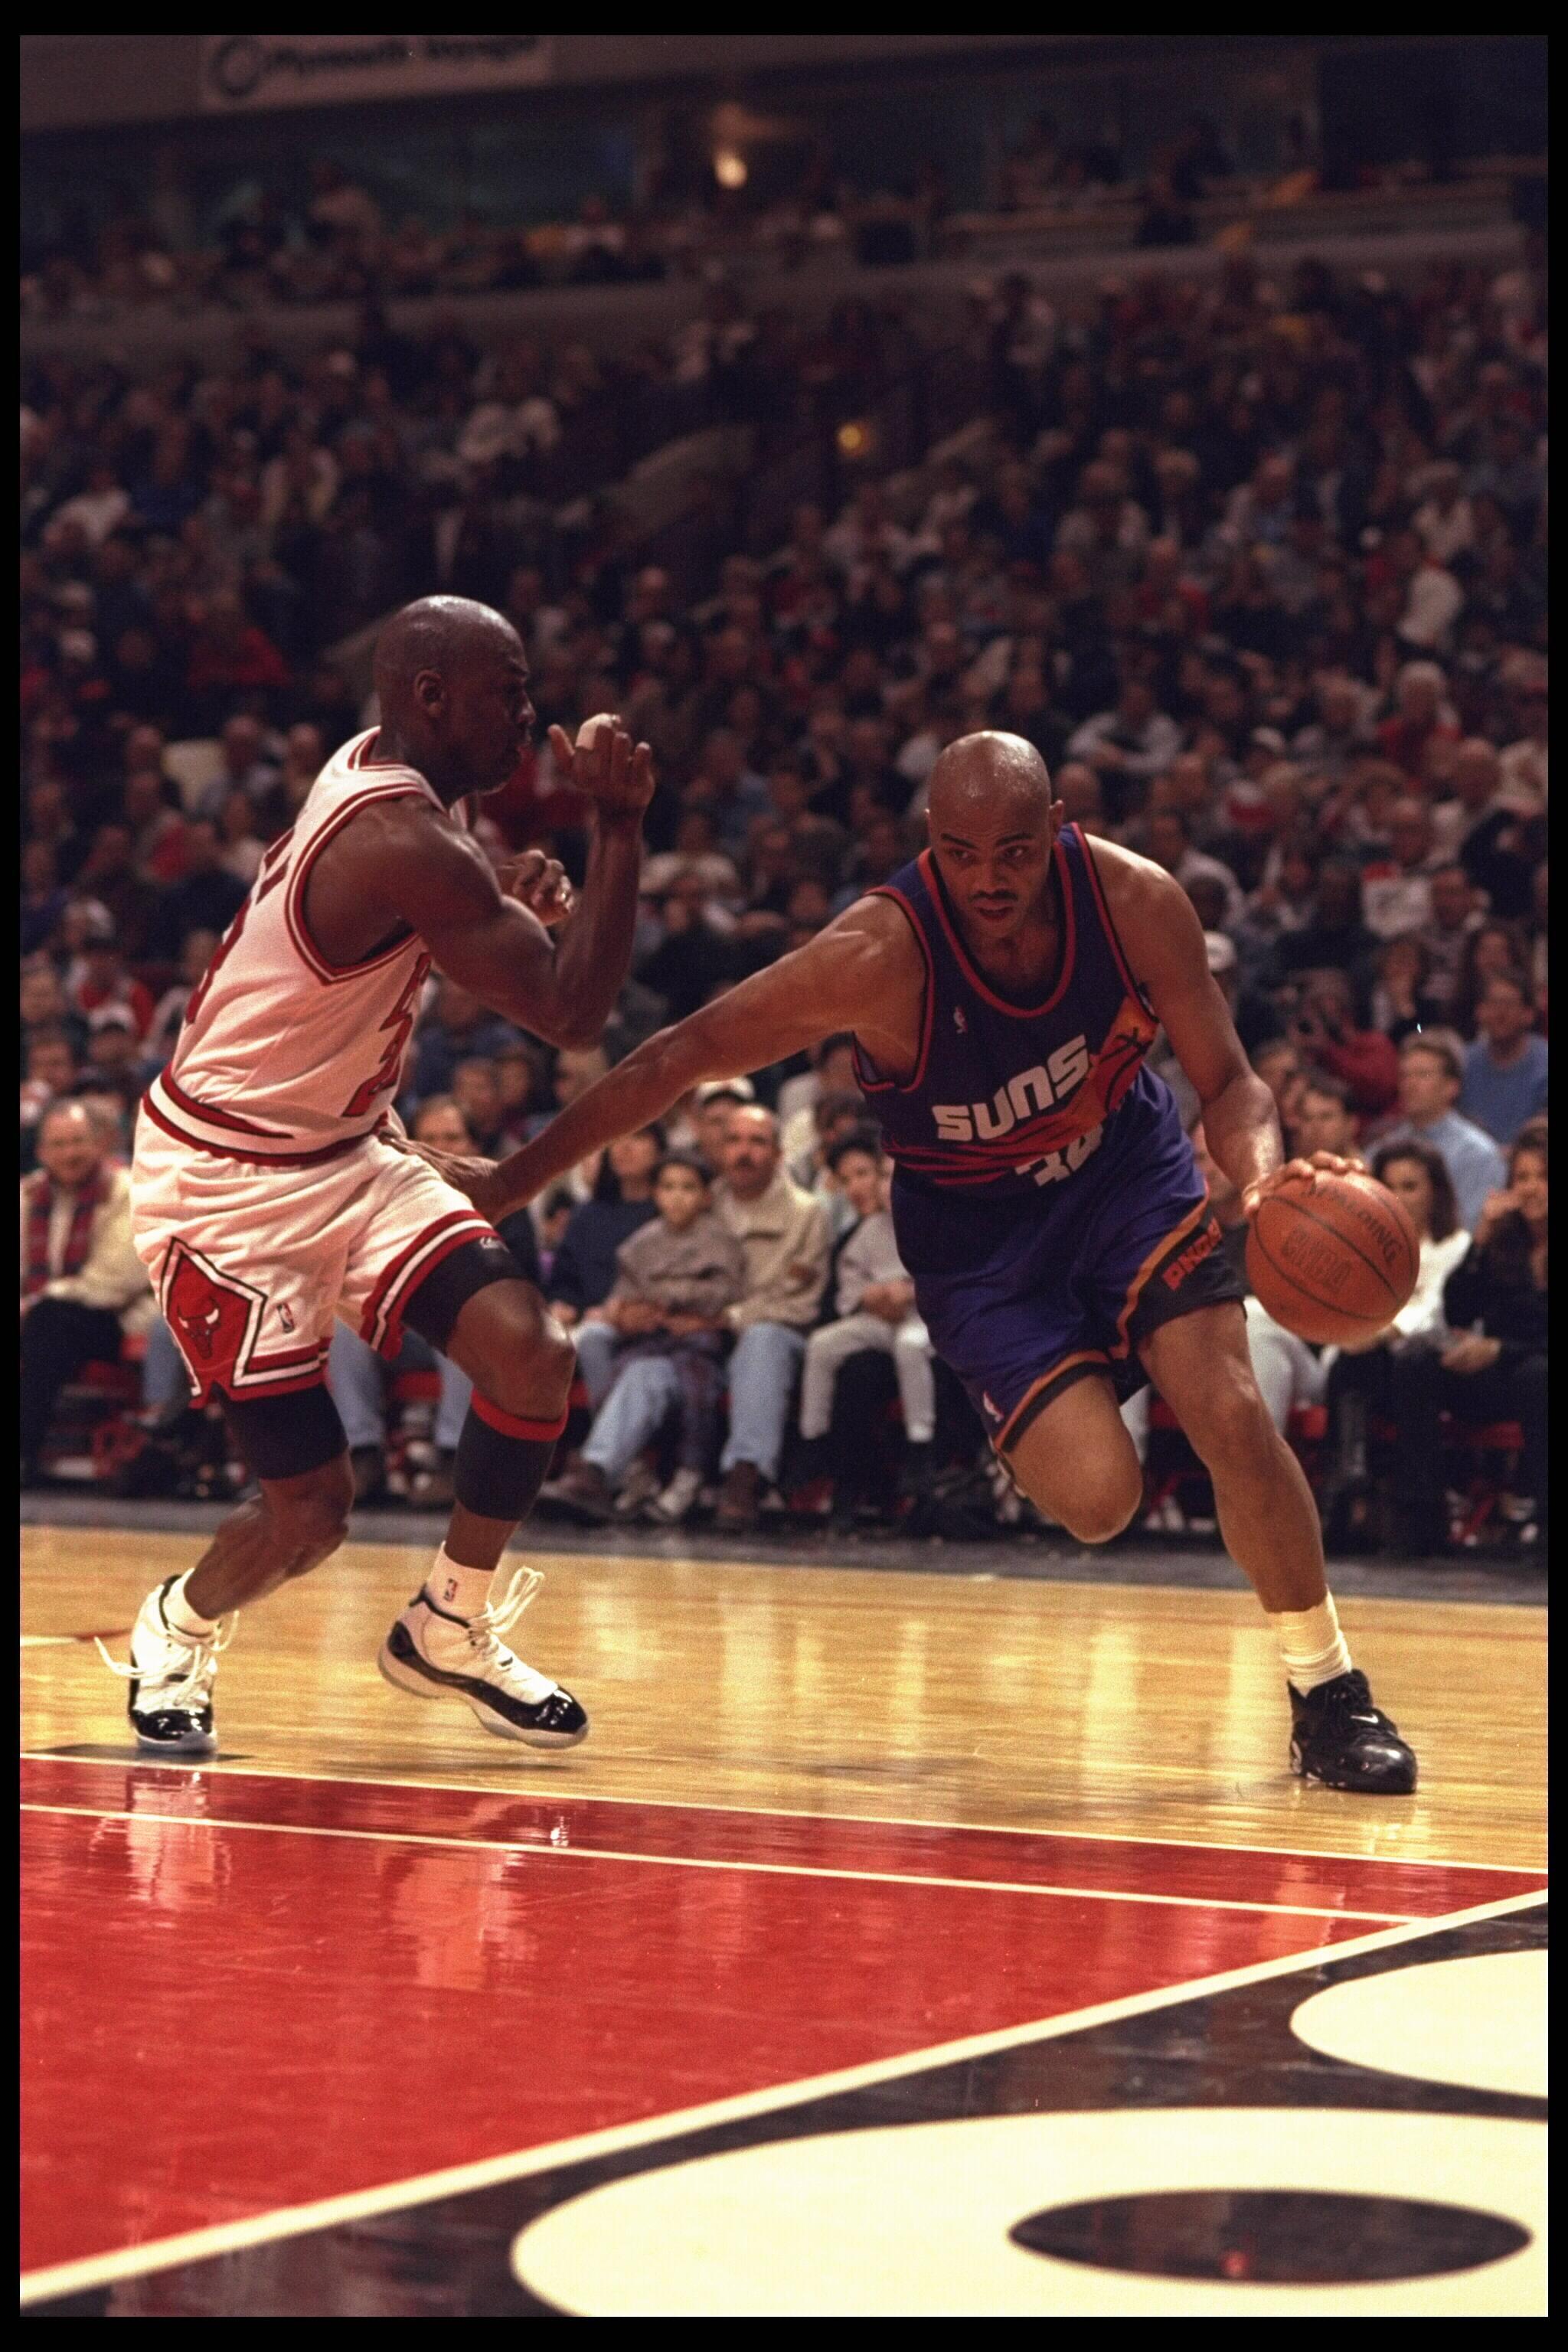 cc696a233f52 28 Jan 1996  Forward Charles Barkley  34 of the Phoenix Suns drives hard  around